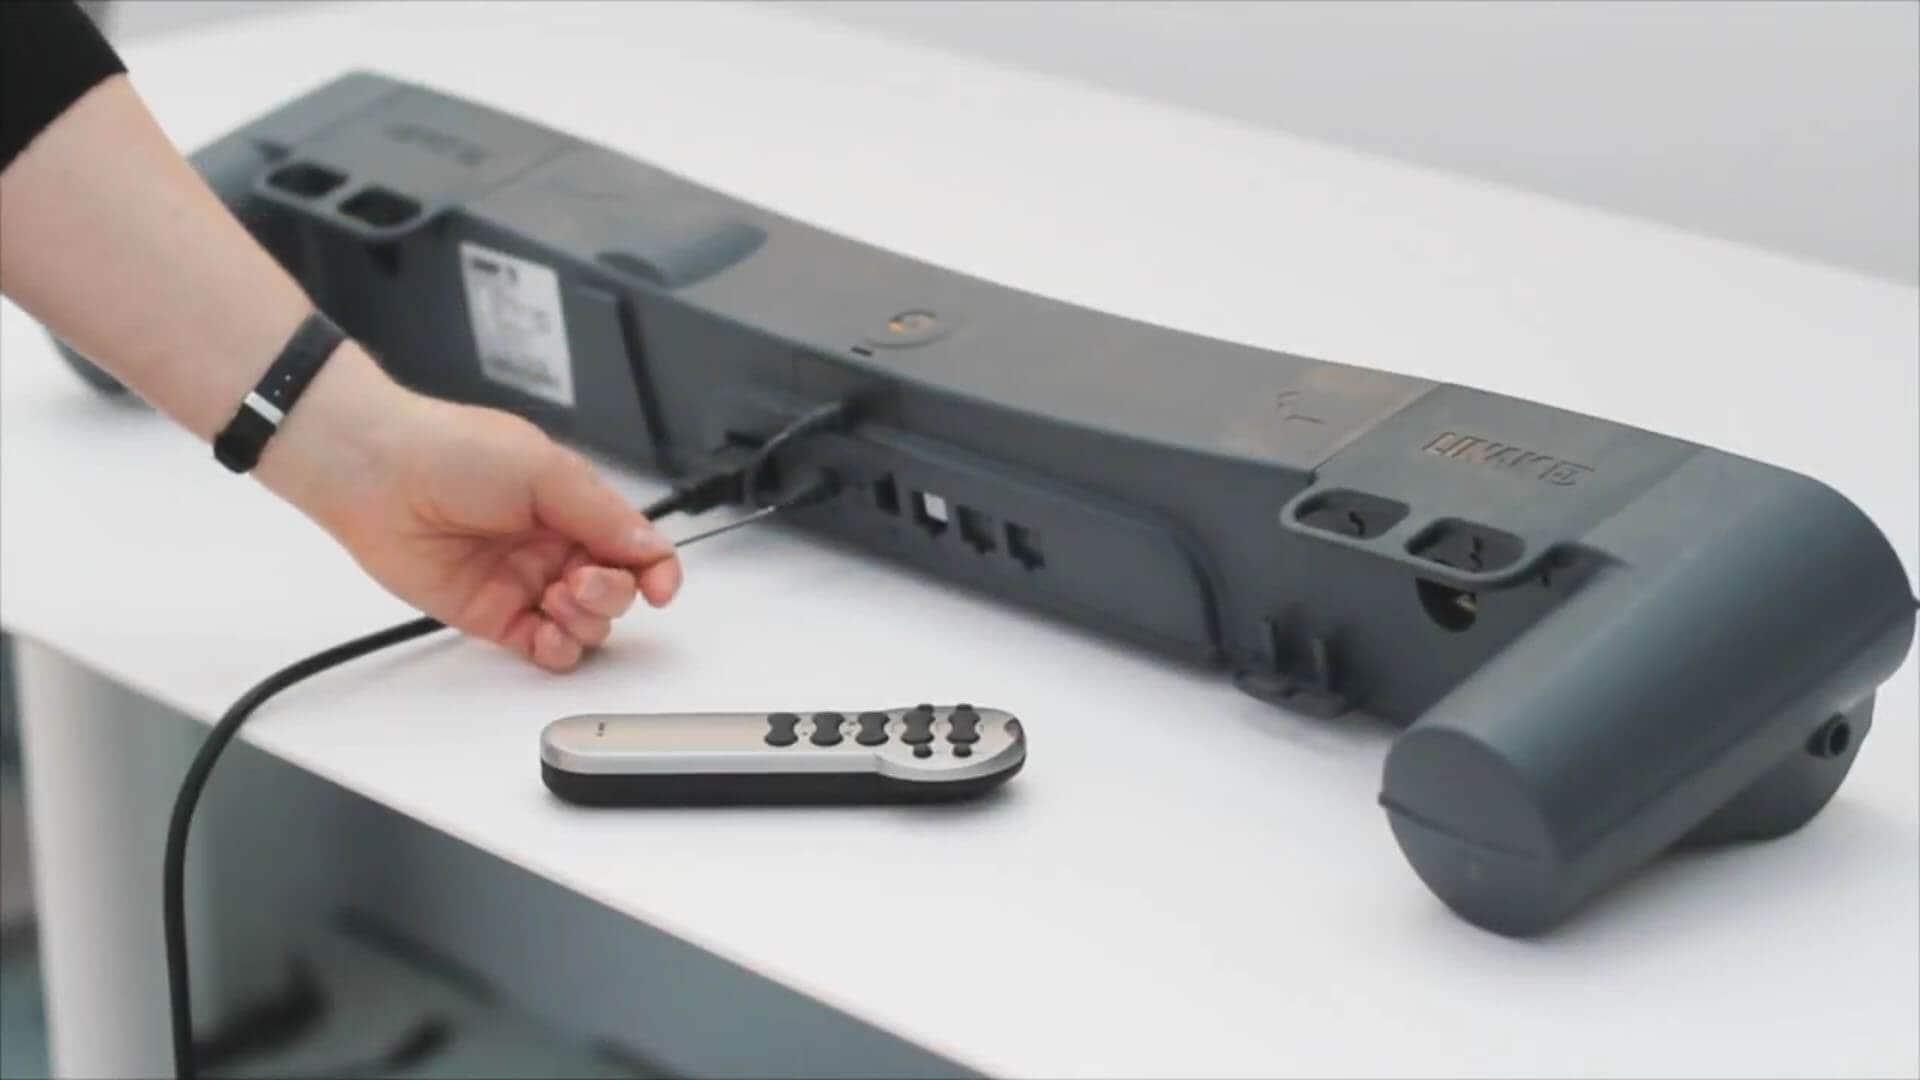 TD3 - 無線コントローラーの設定方法